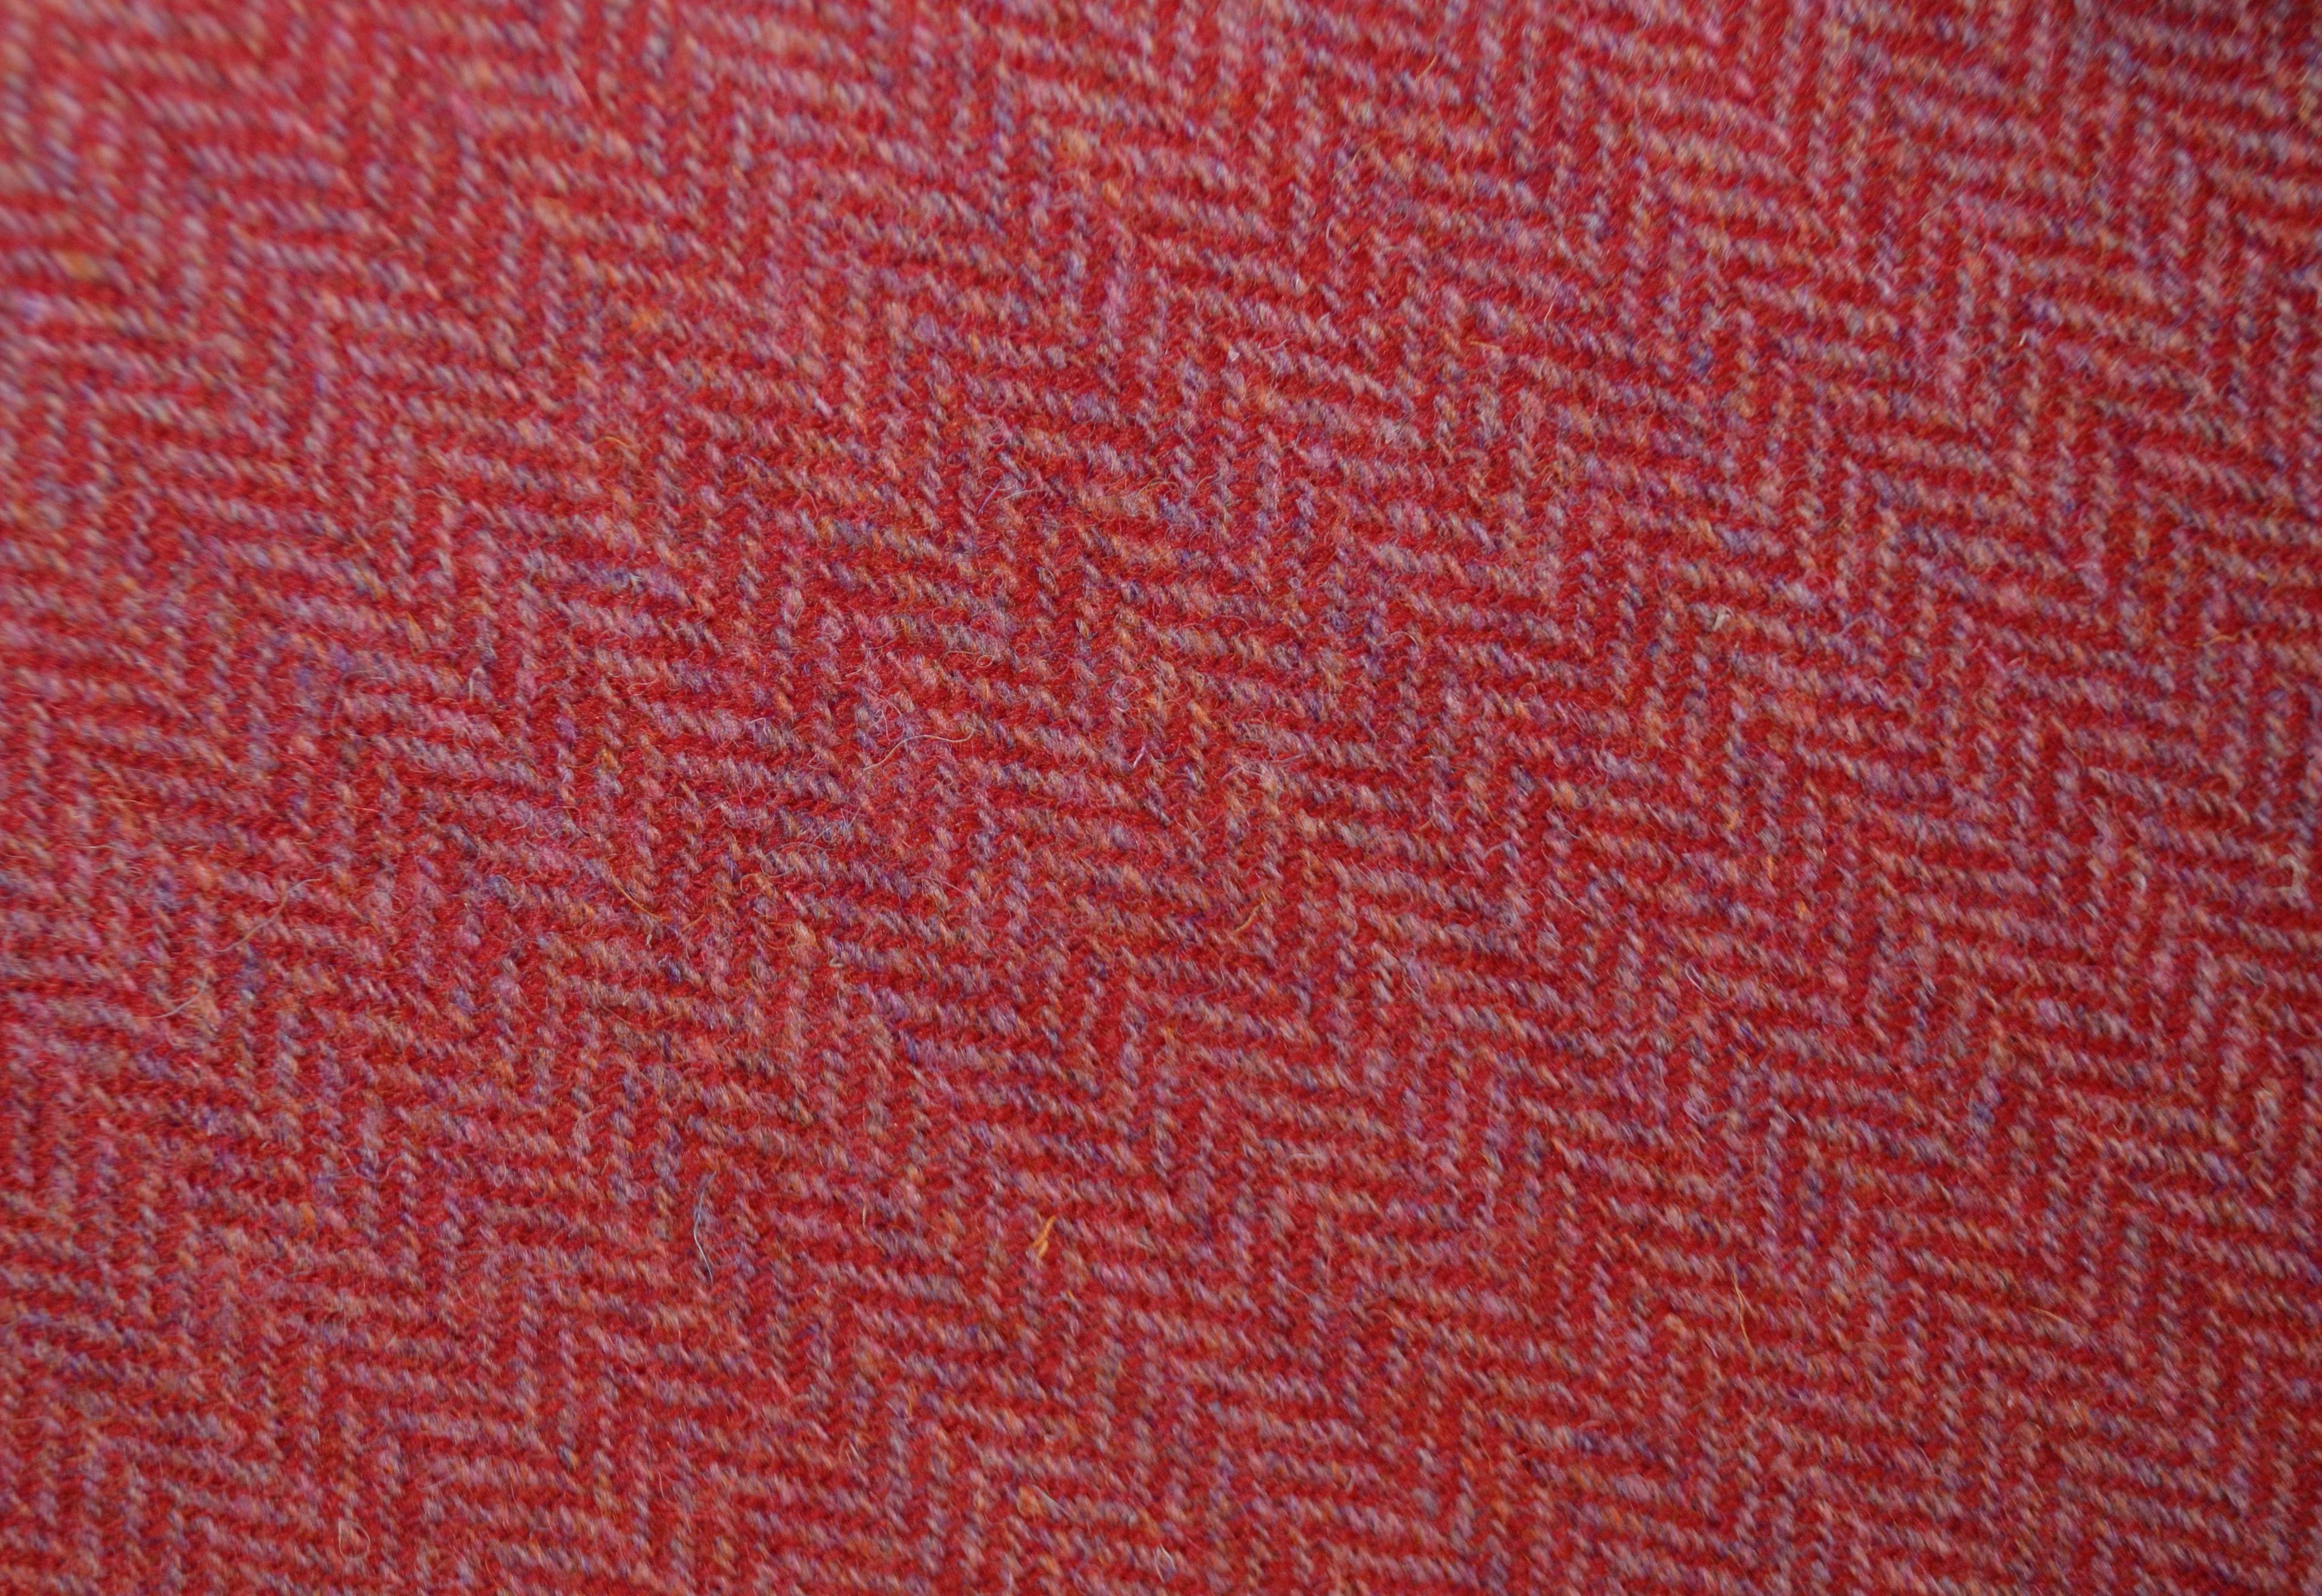 Herringbone Harris Tweed Handmaiden Uk